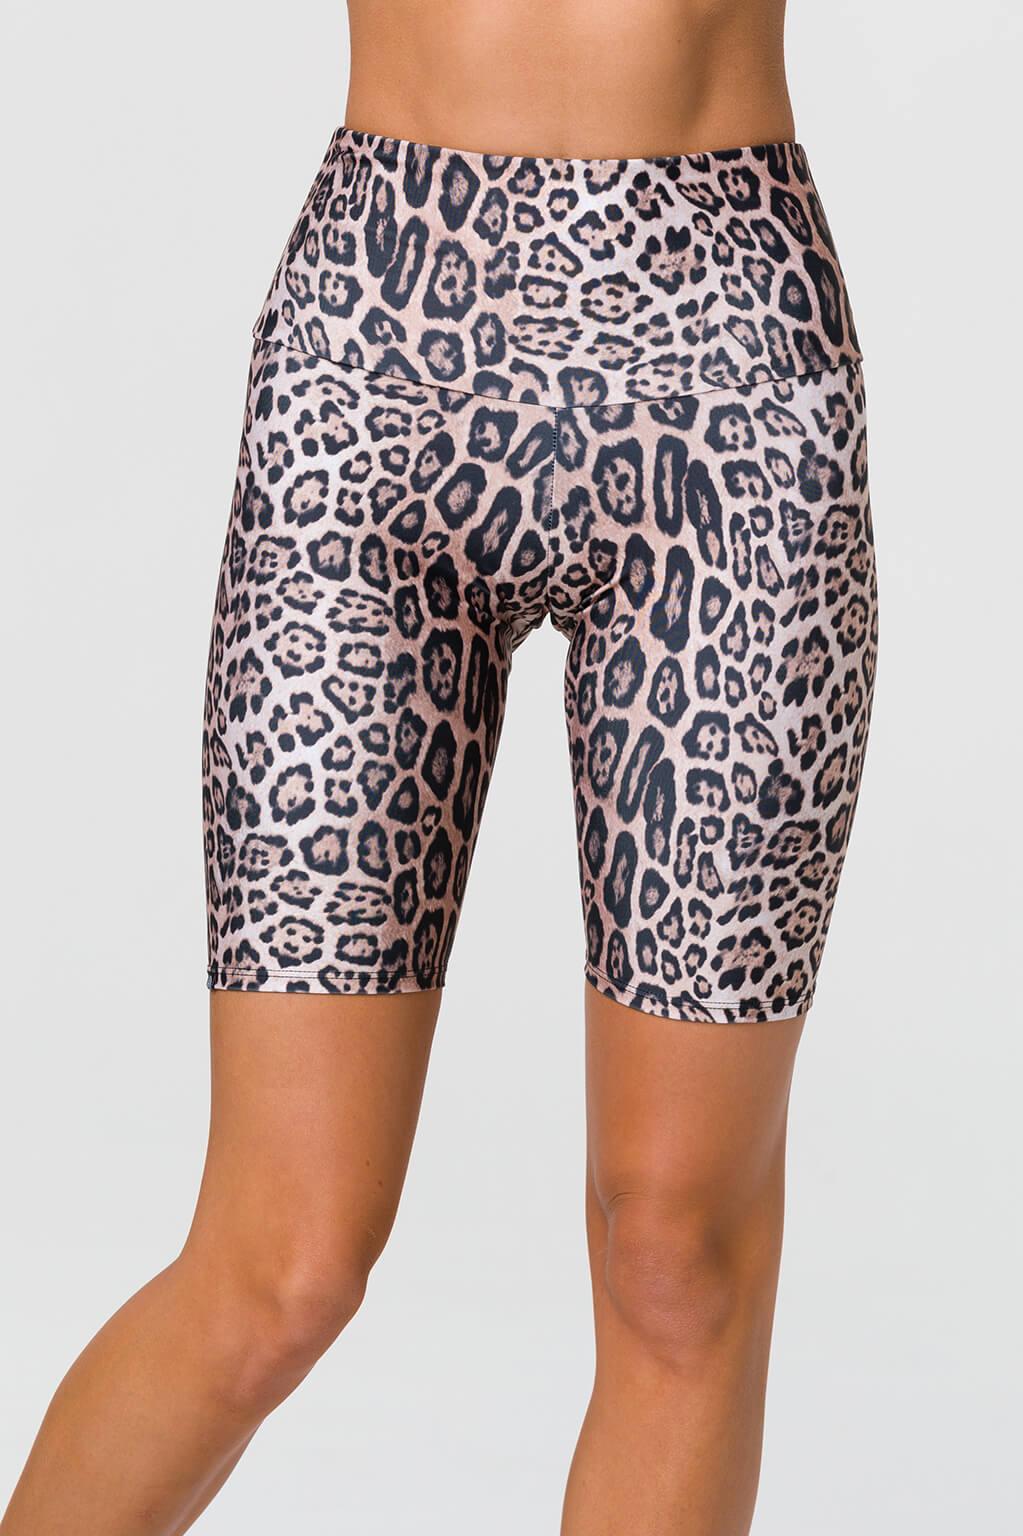 high-rise-bike-short-leopard